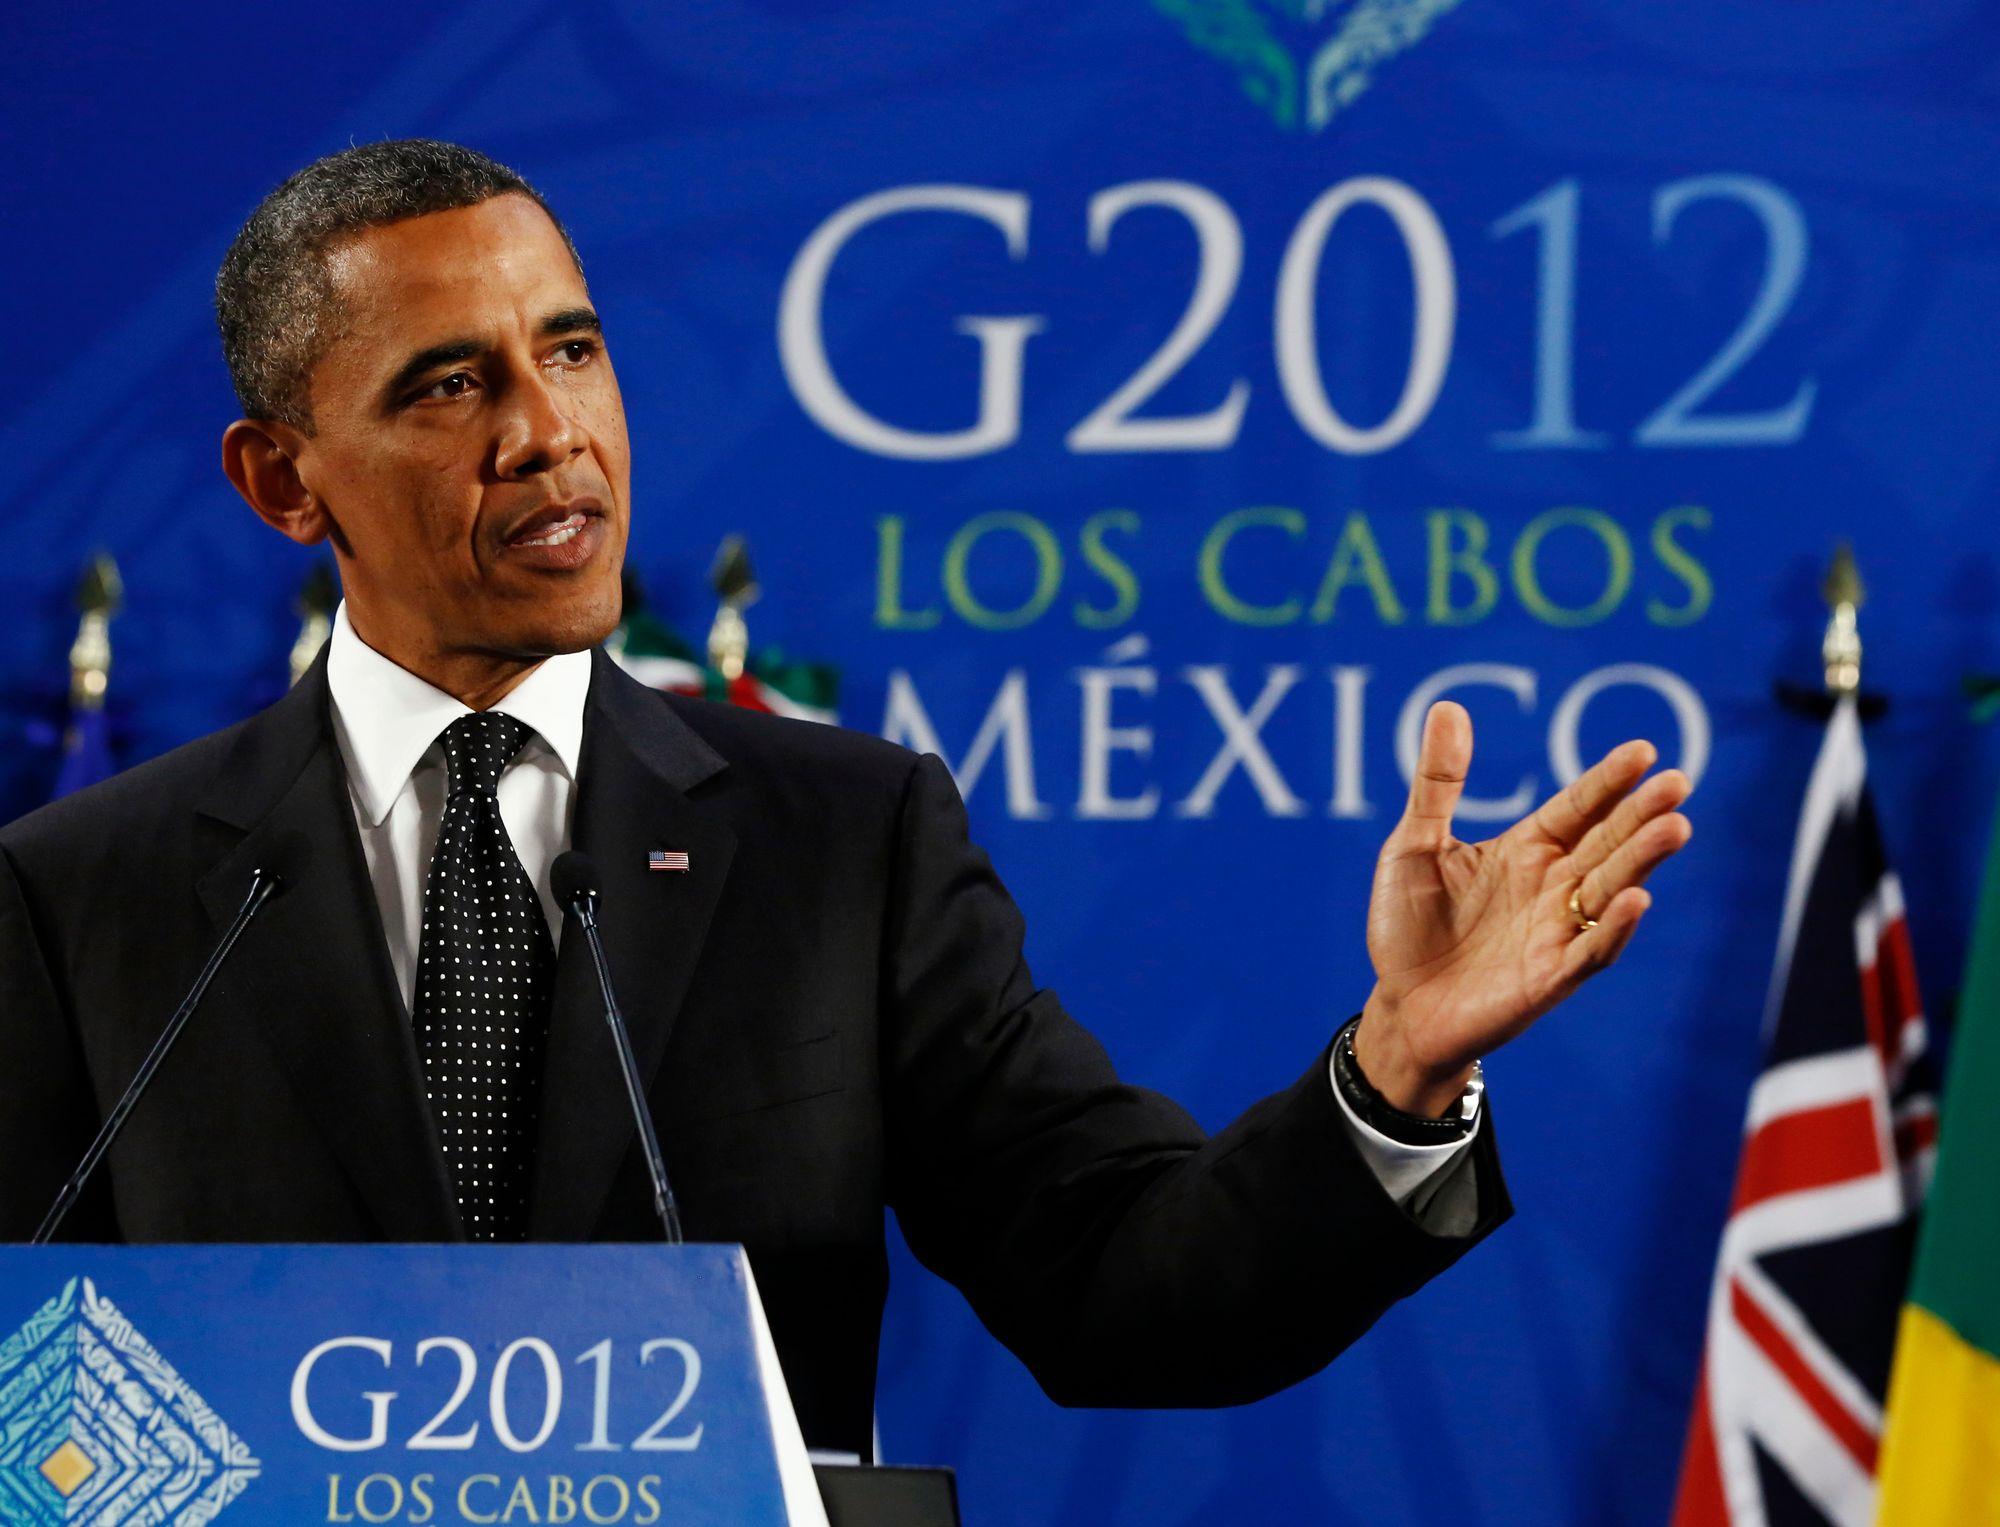 Rencontre g20